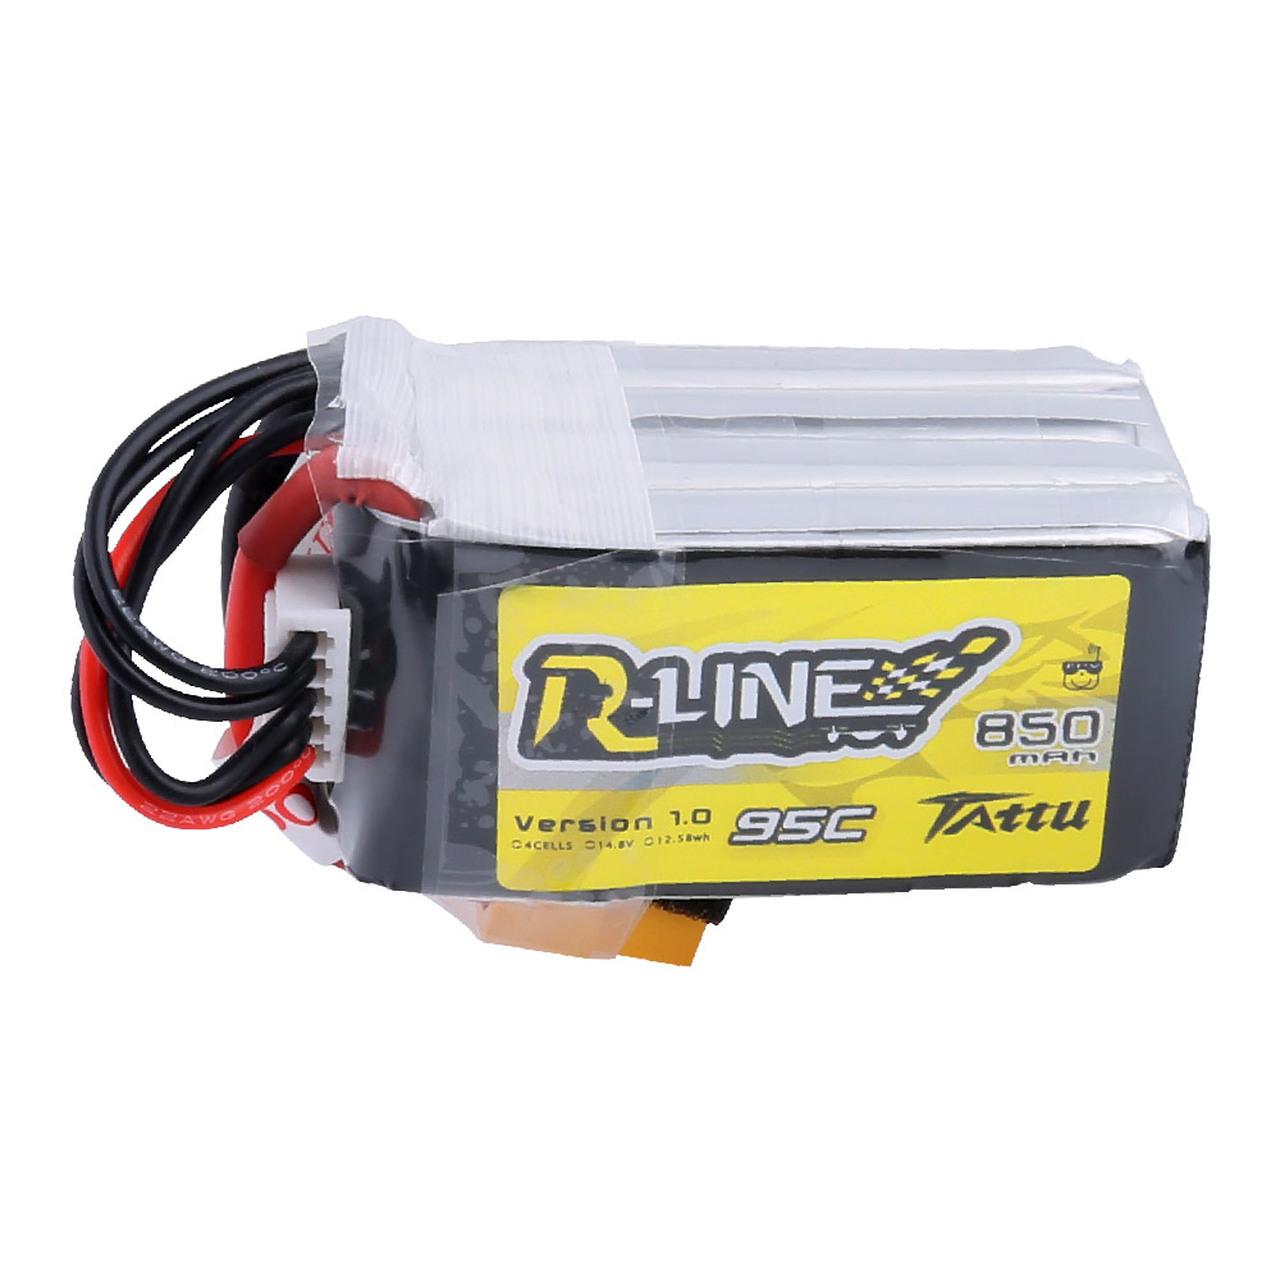 Tattu R-Line 850mAh 14.8V 95C 4S1P Lipo Battery Pack with XT60 Plug